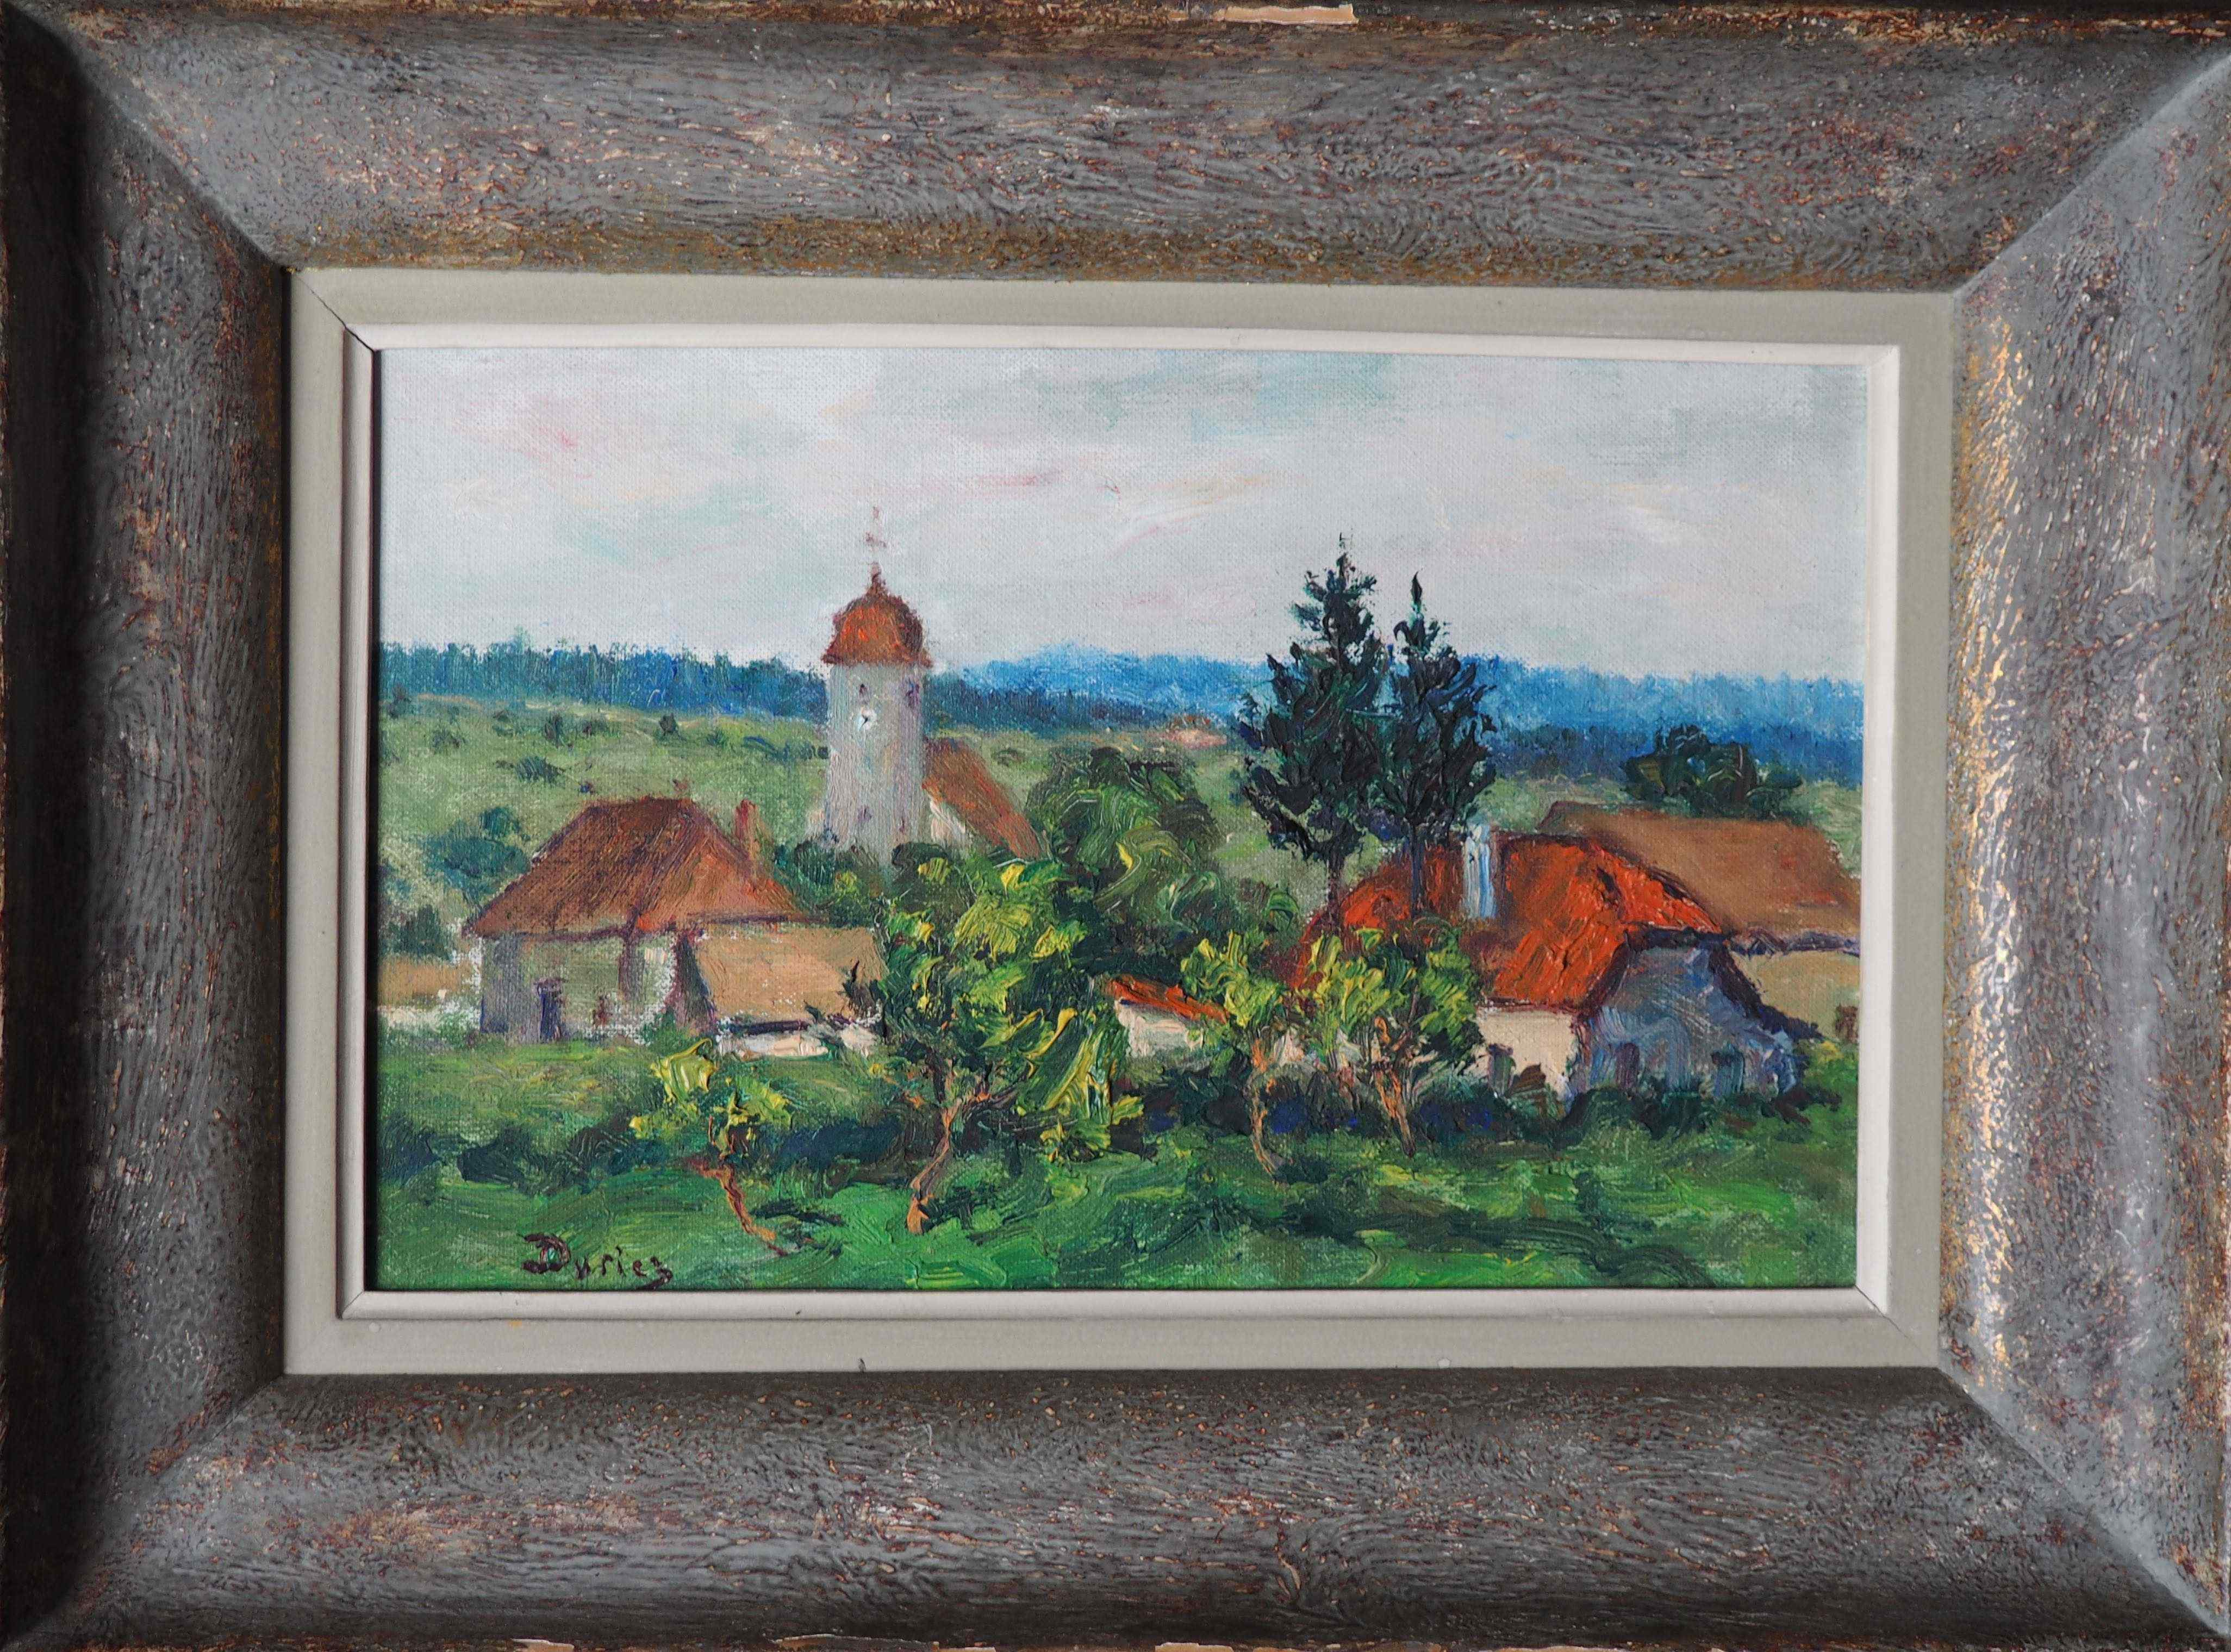 Andelot Jura by Julien Duriez, olio su tela, XX secolo